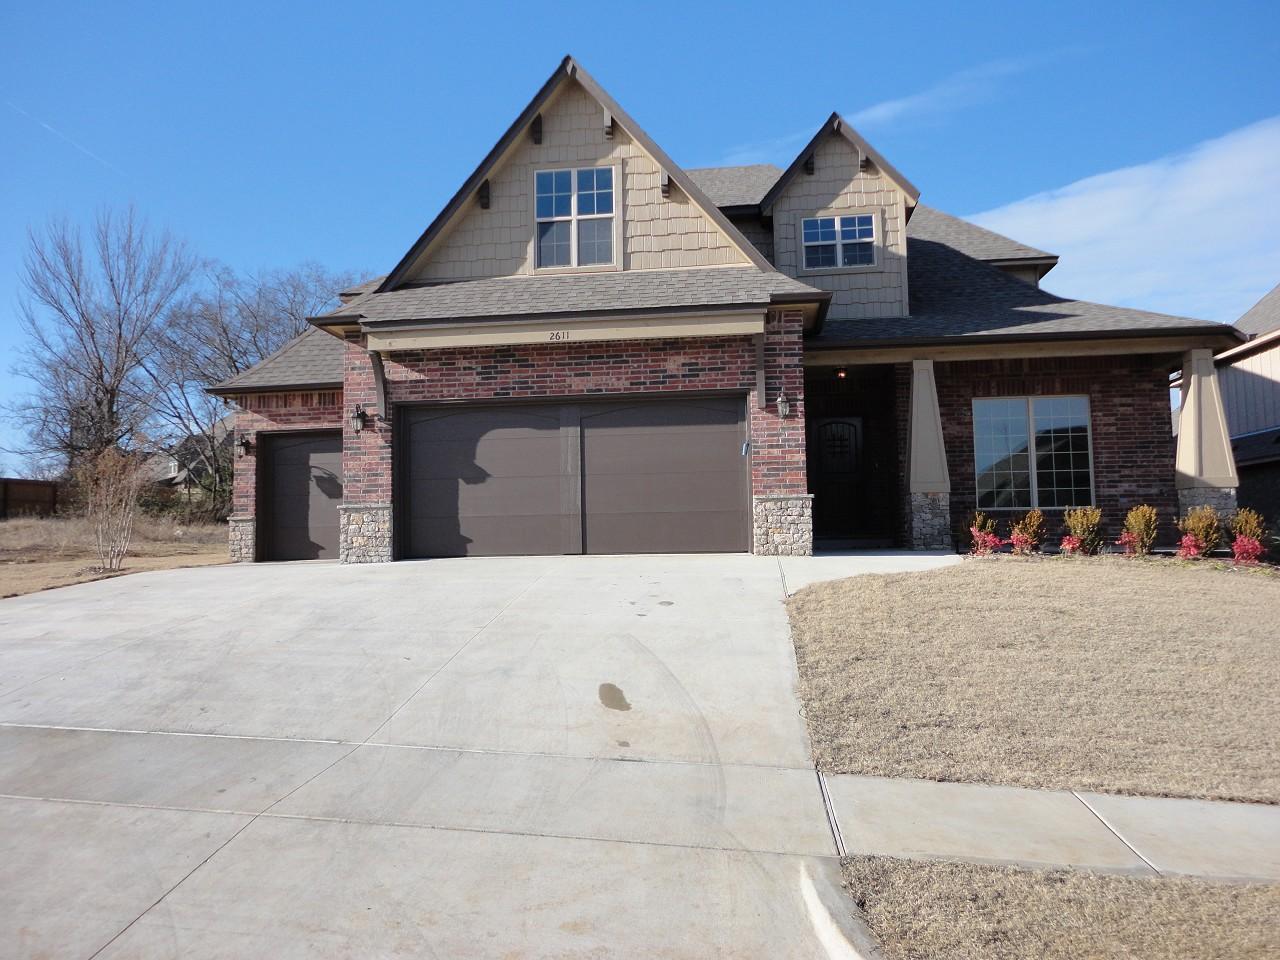 Real Estate for Sale, ListingId: 30104441, Jenks,OK74037